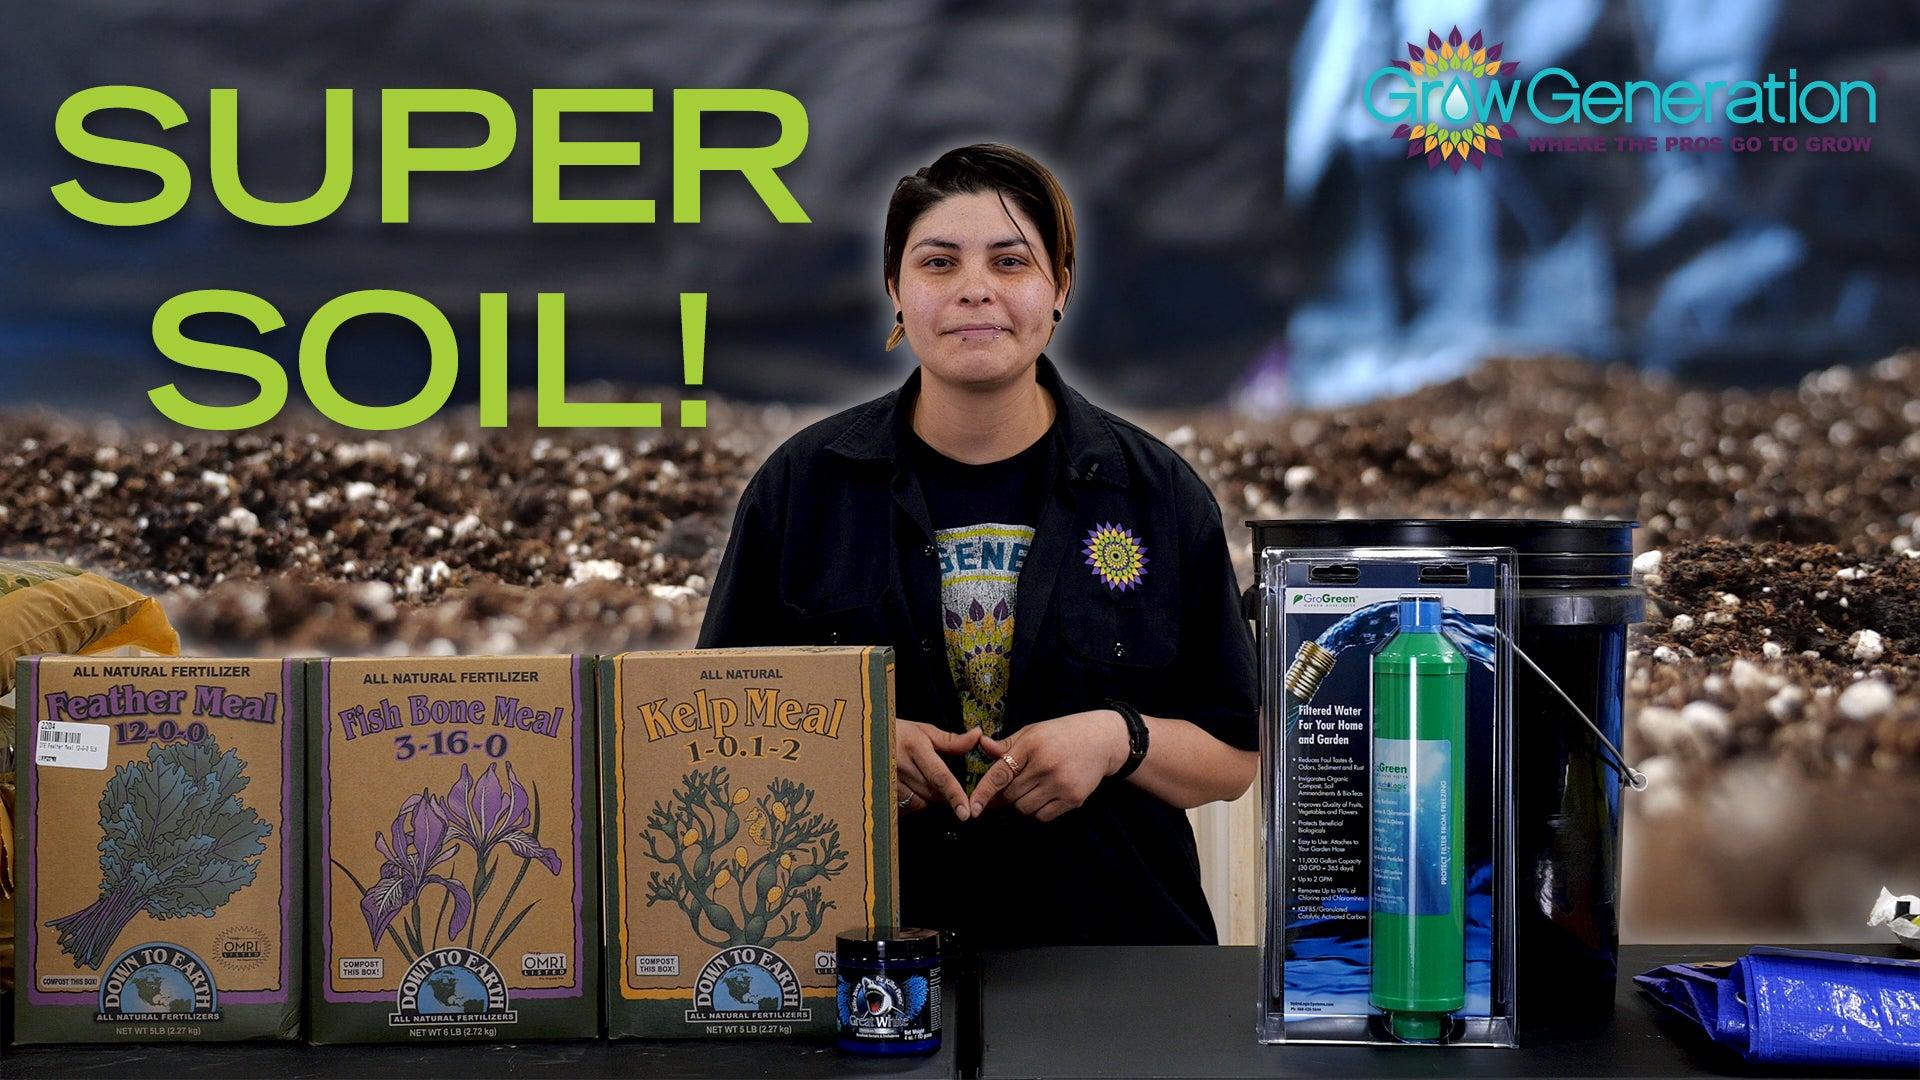 How to Make Super Soil